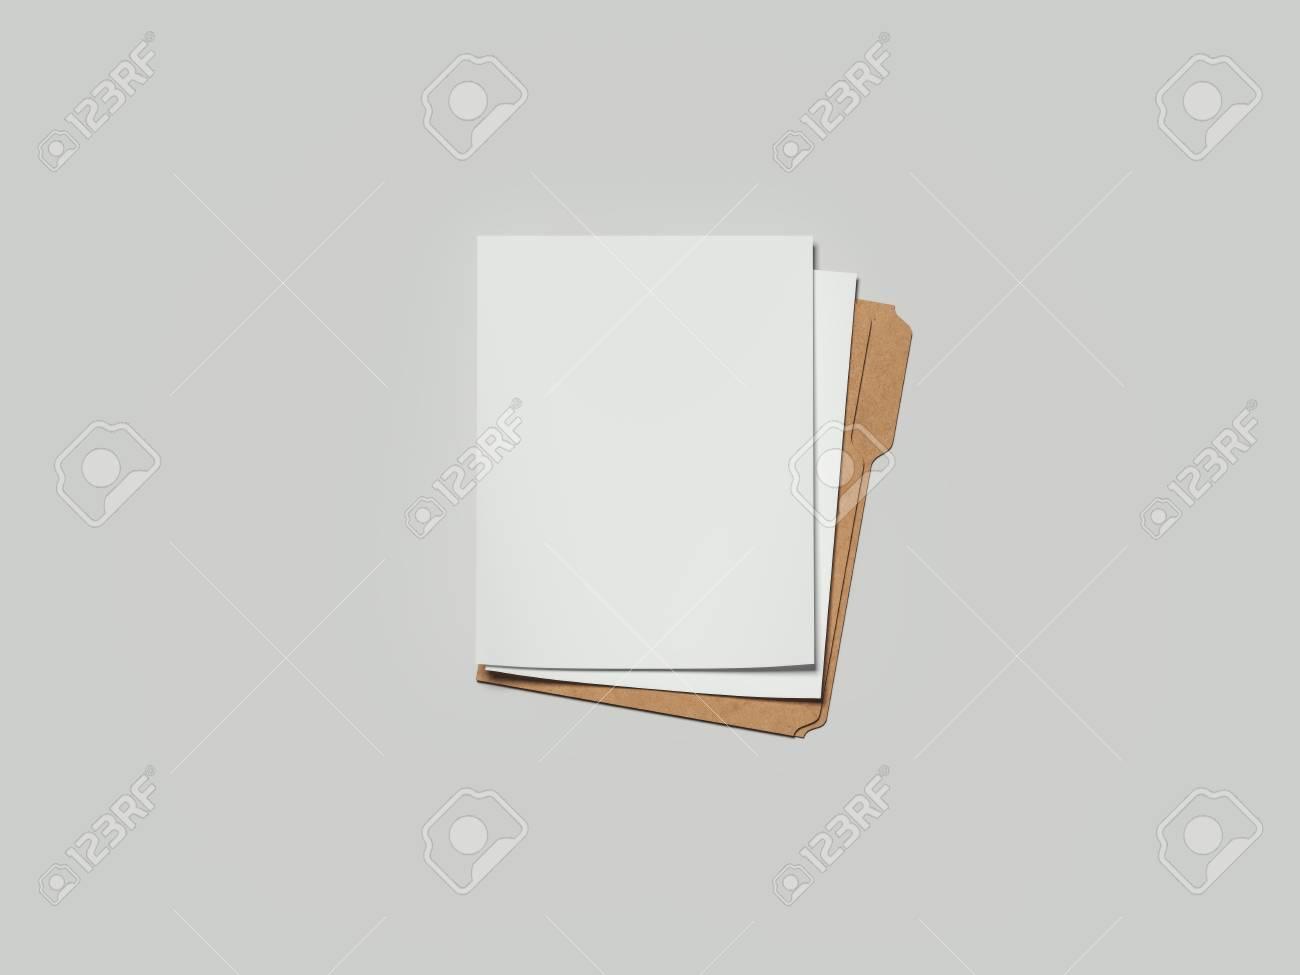 Cardboard folder with paper, 3d rendering - 100270284